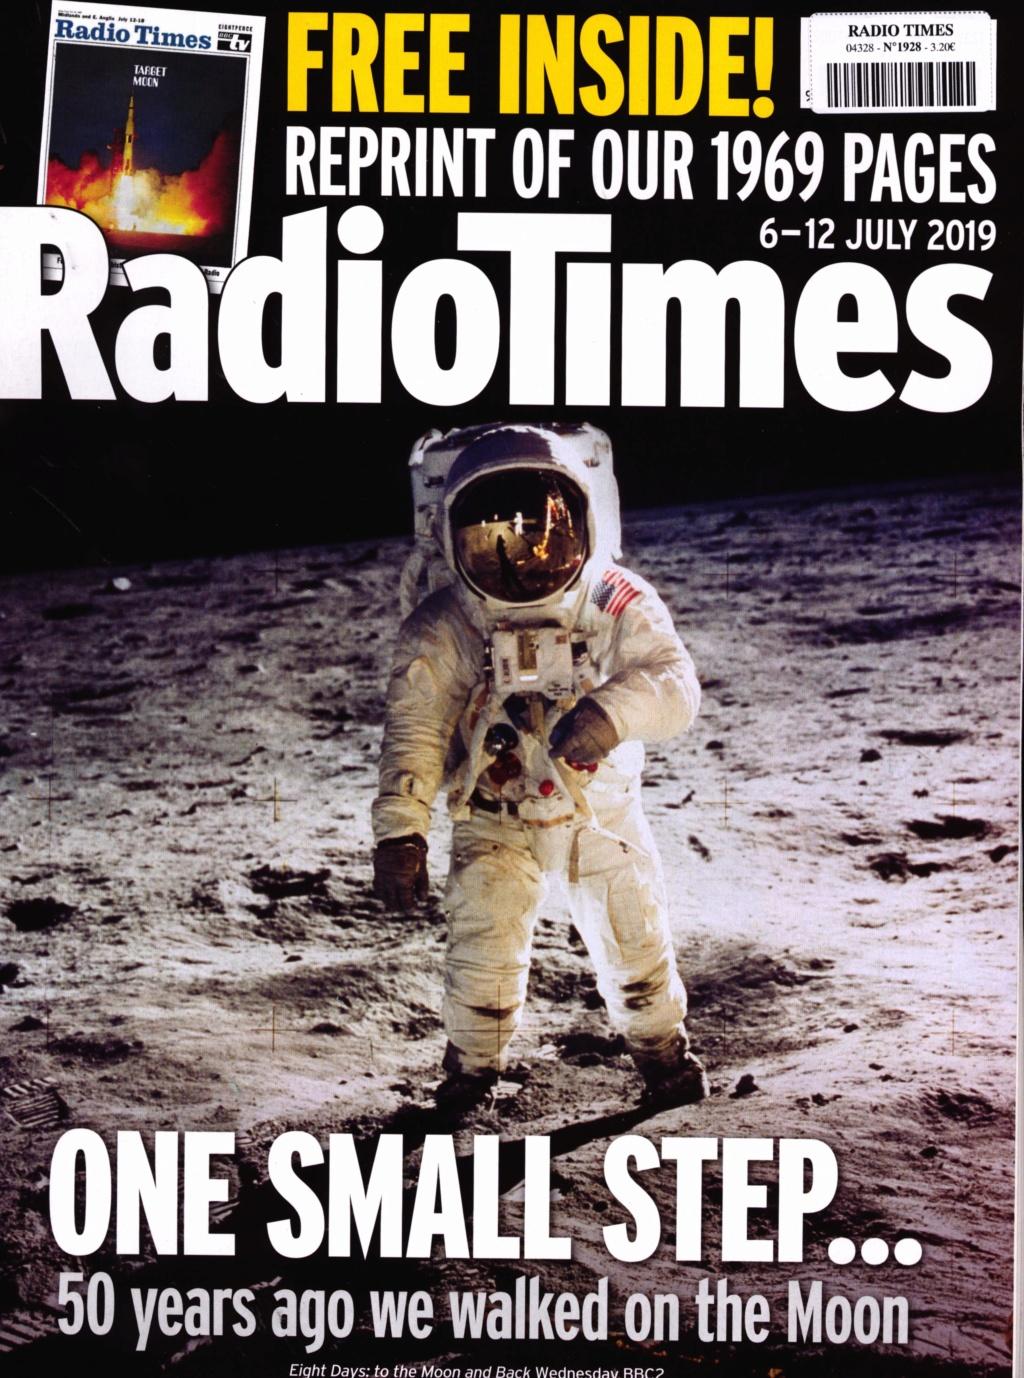 Le spatial dans la presse - Page 9 Radio10